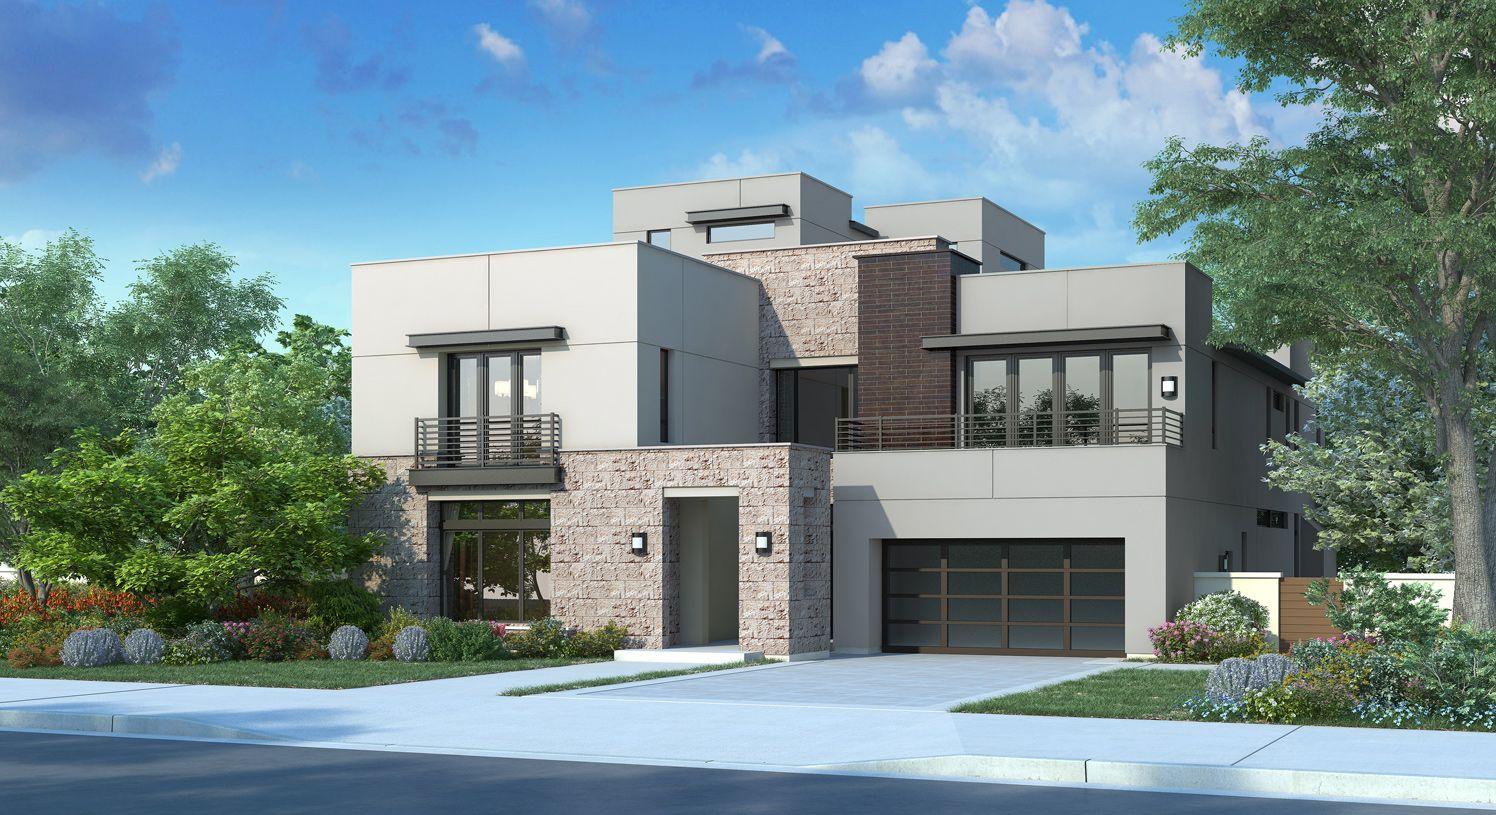 Single Family for Sale at Alara At Altair - Calypso Elite 54 Gravity Irvine, California 92618 United States